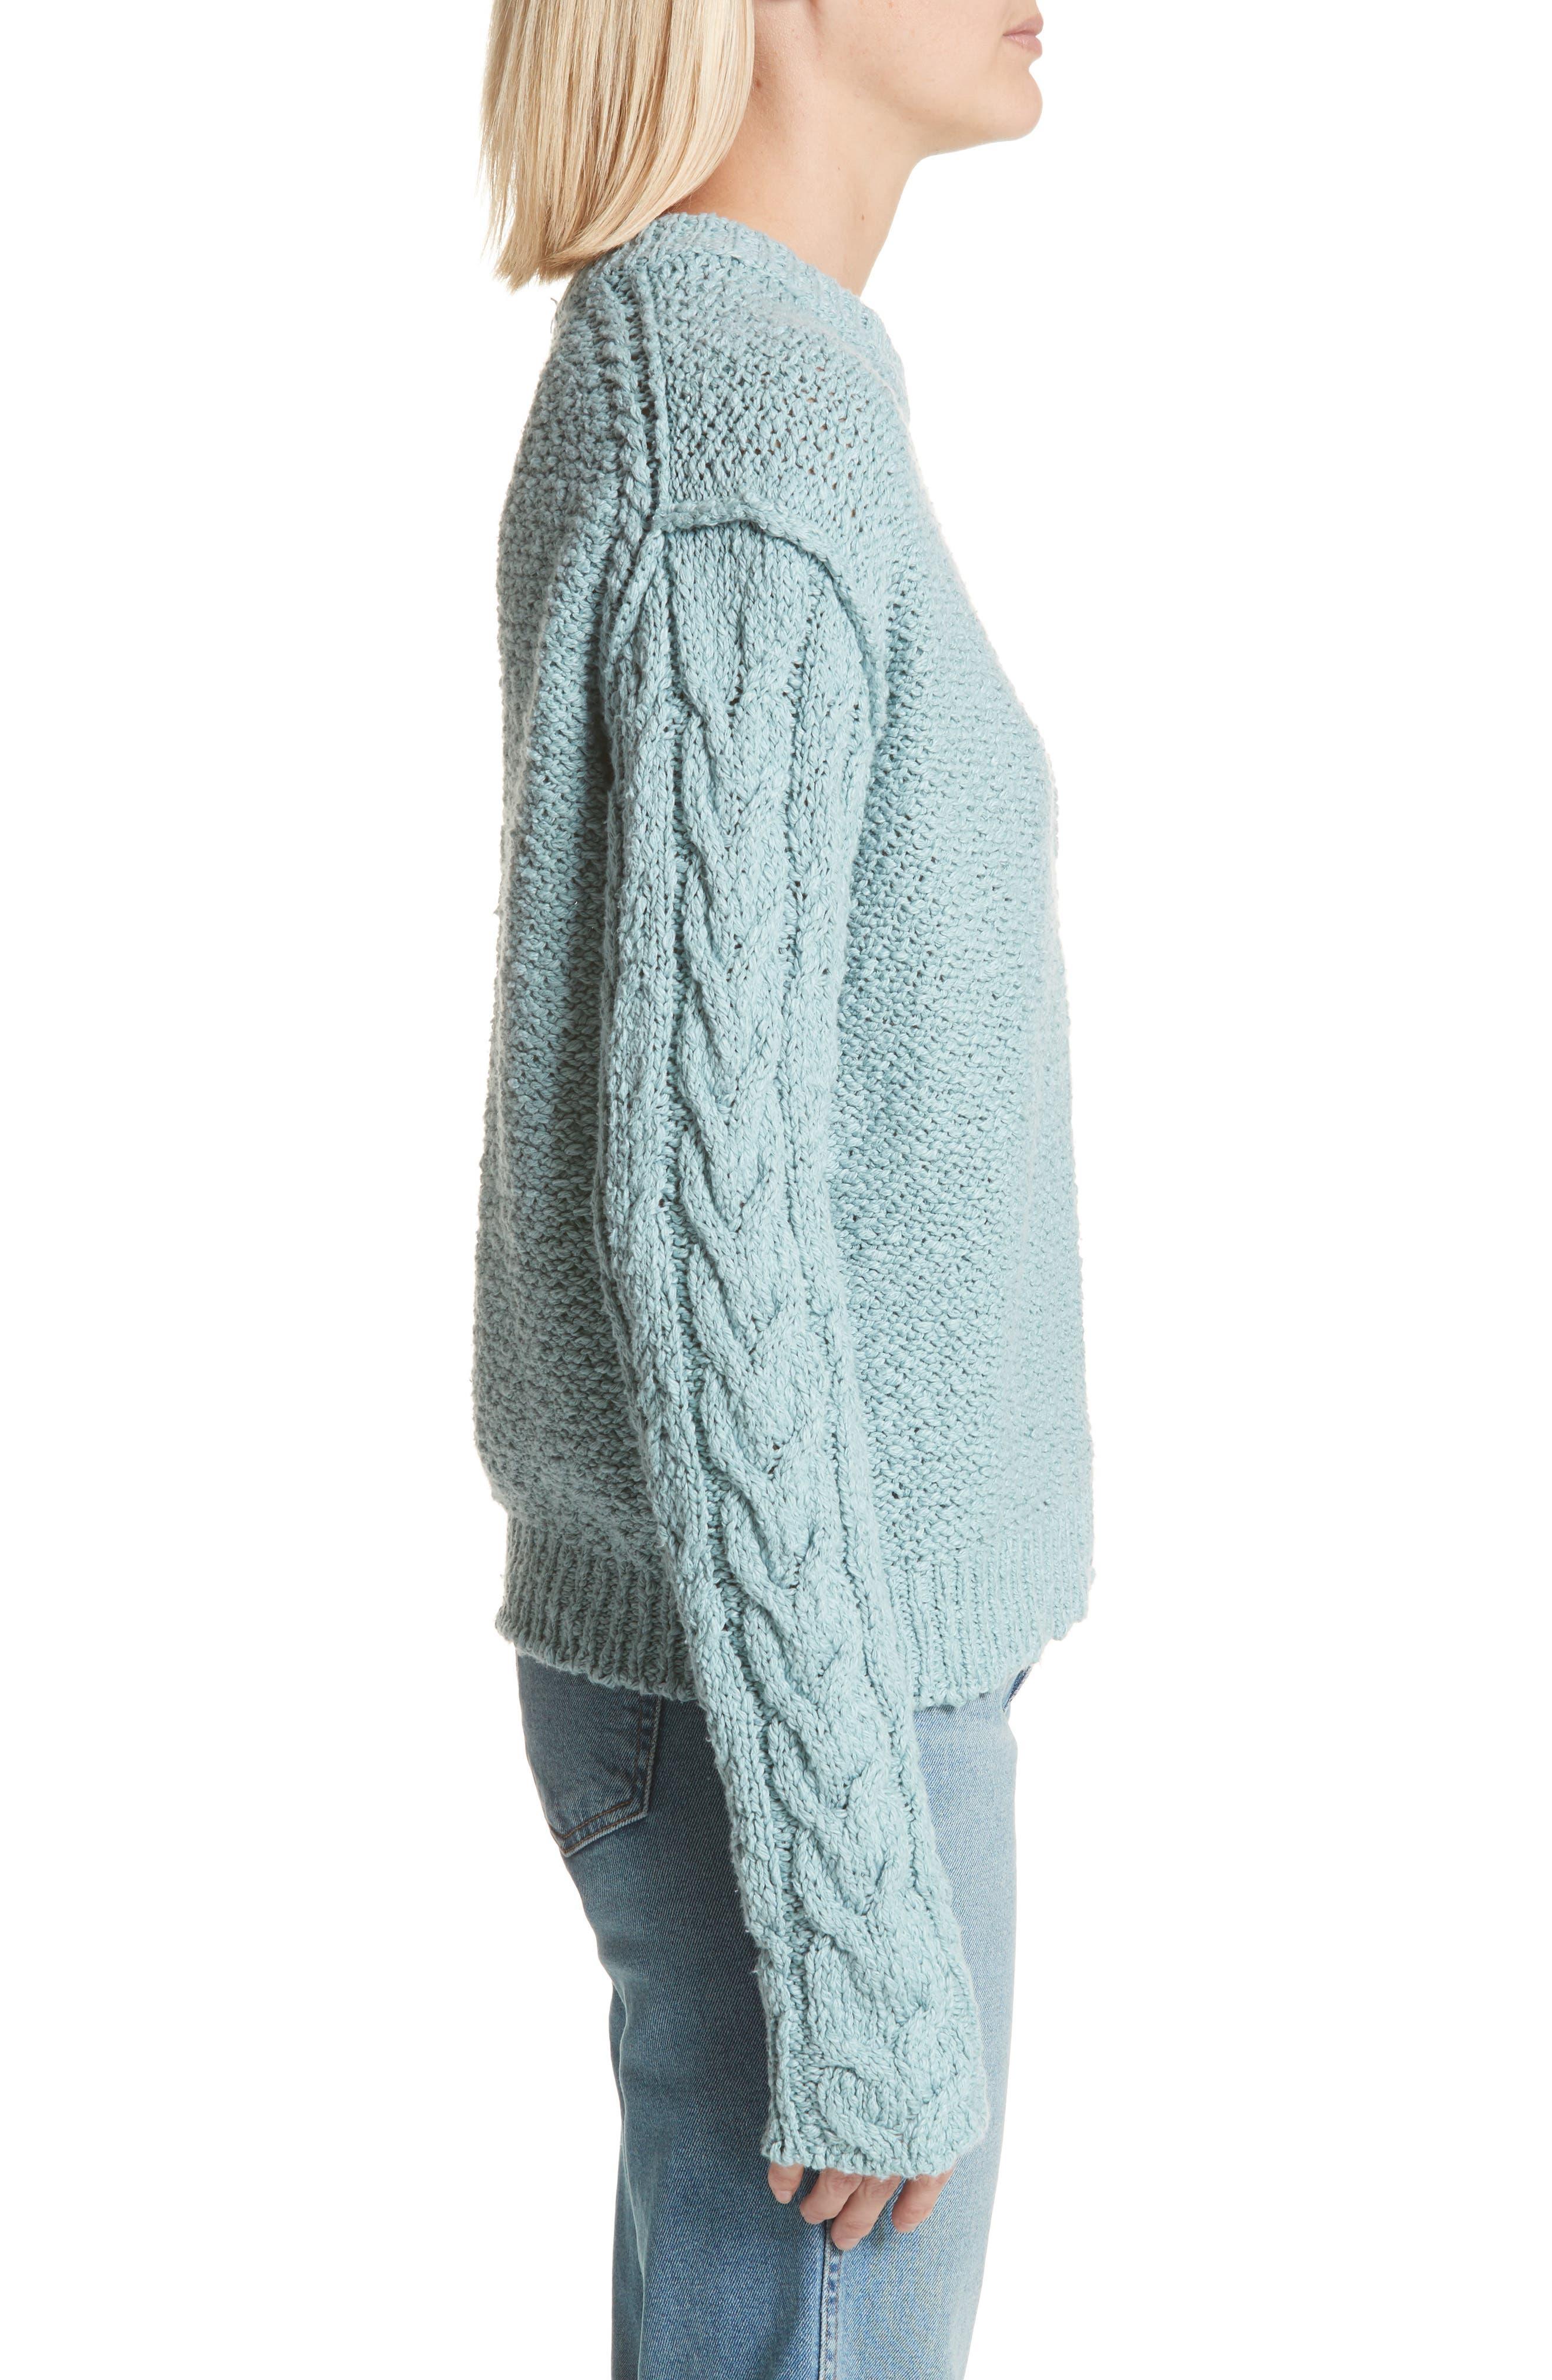 Hila Cable Sleeve Sweater,                             Alternate thumbnail 3, color,                             Blue